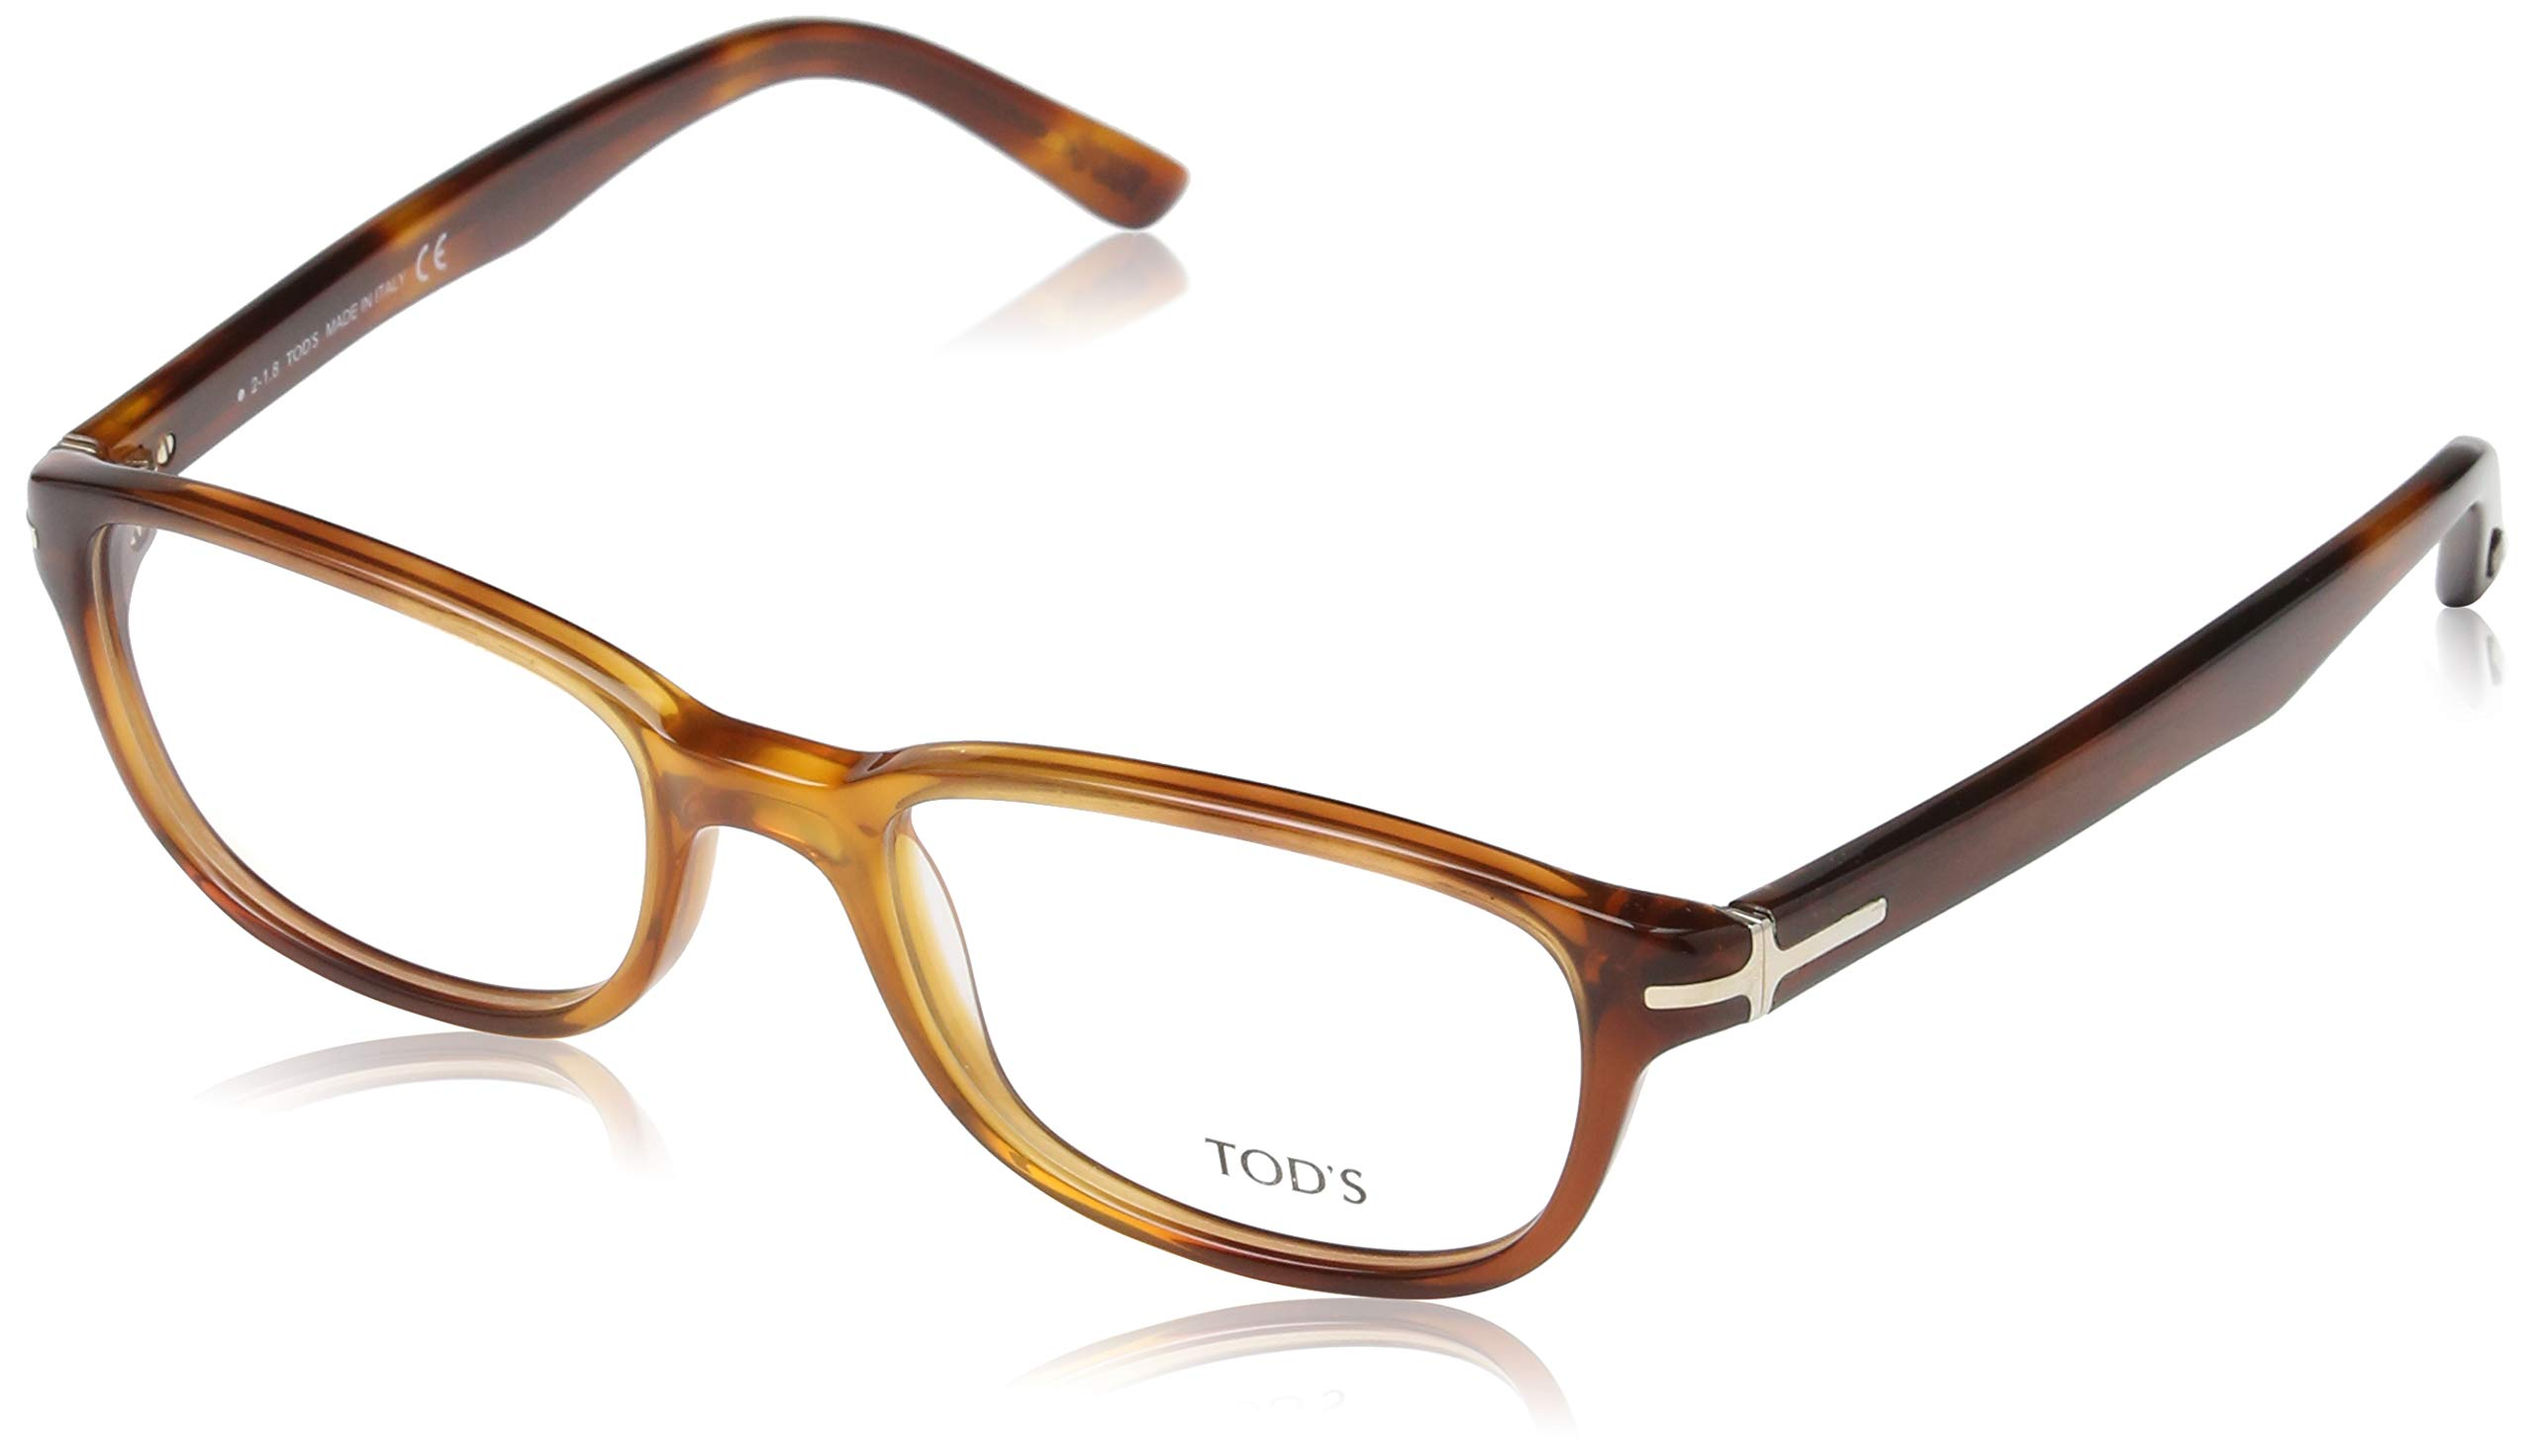 SoleilMulticoloremehrfarbig52 Brillengestelle To5092 Lunettes De 0 Tod's Homme 1c3KTJ5ulF